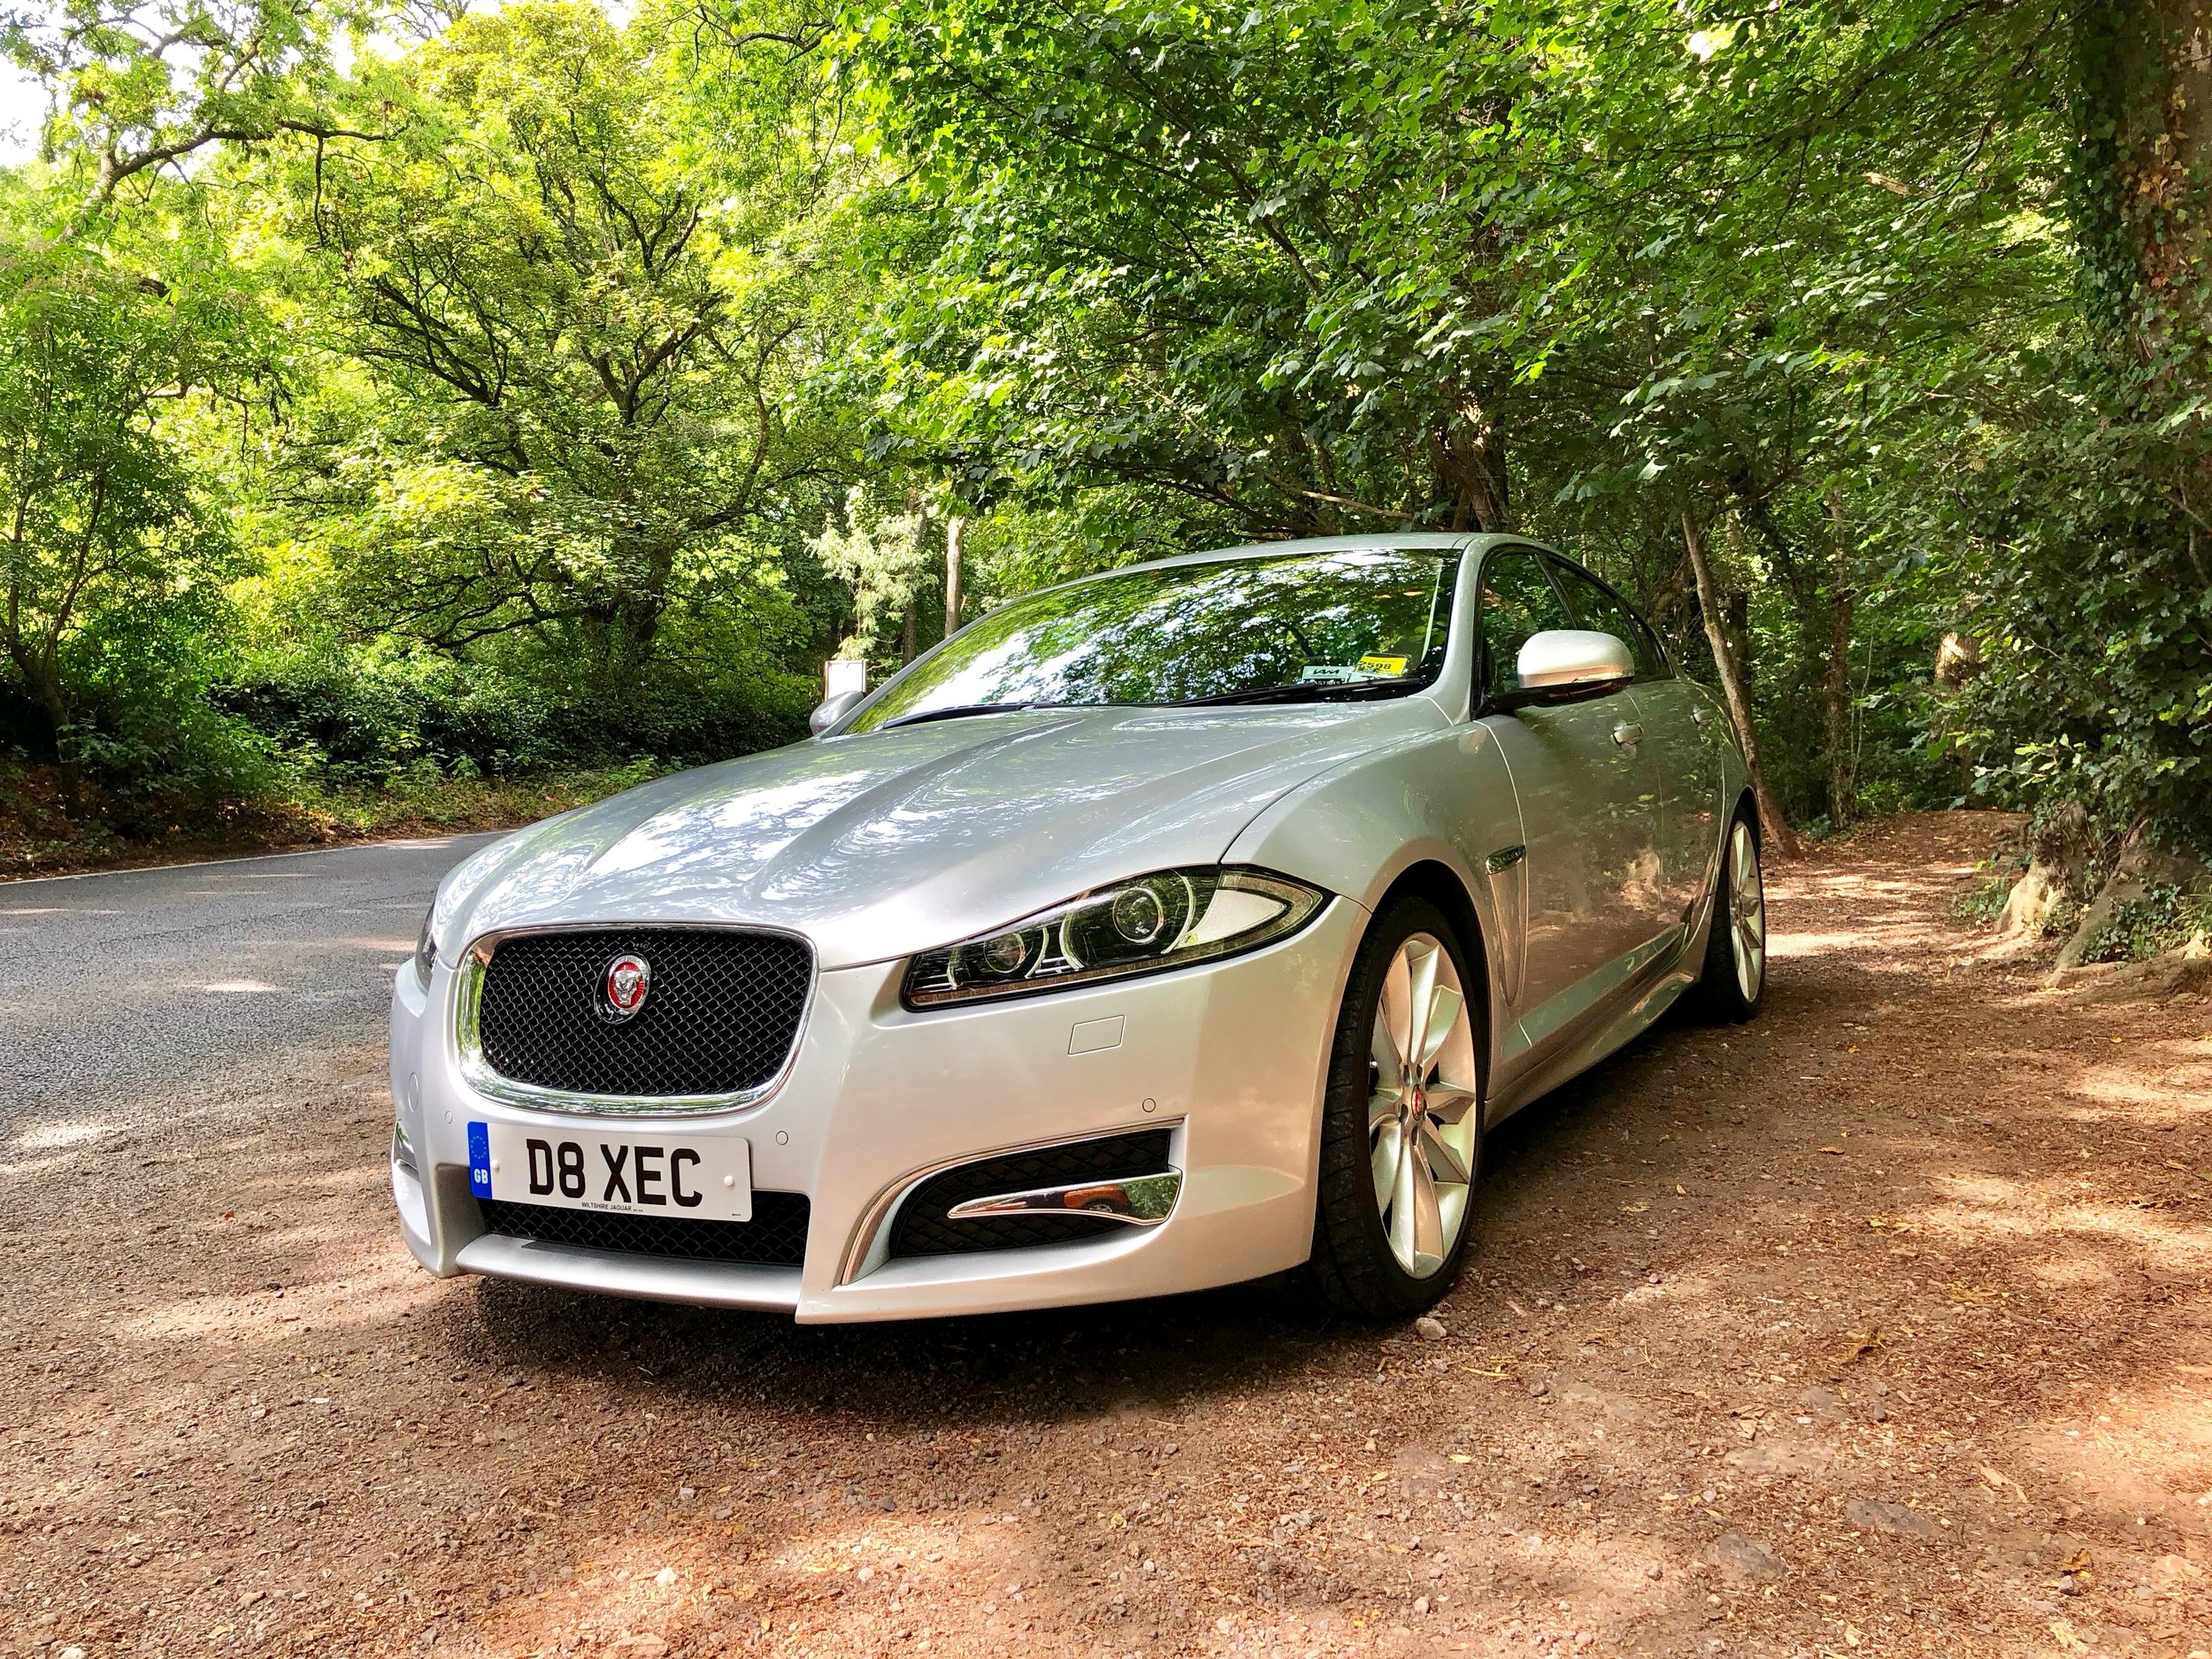 Jaguar XFS Lost In The Wilderness